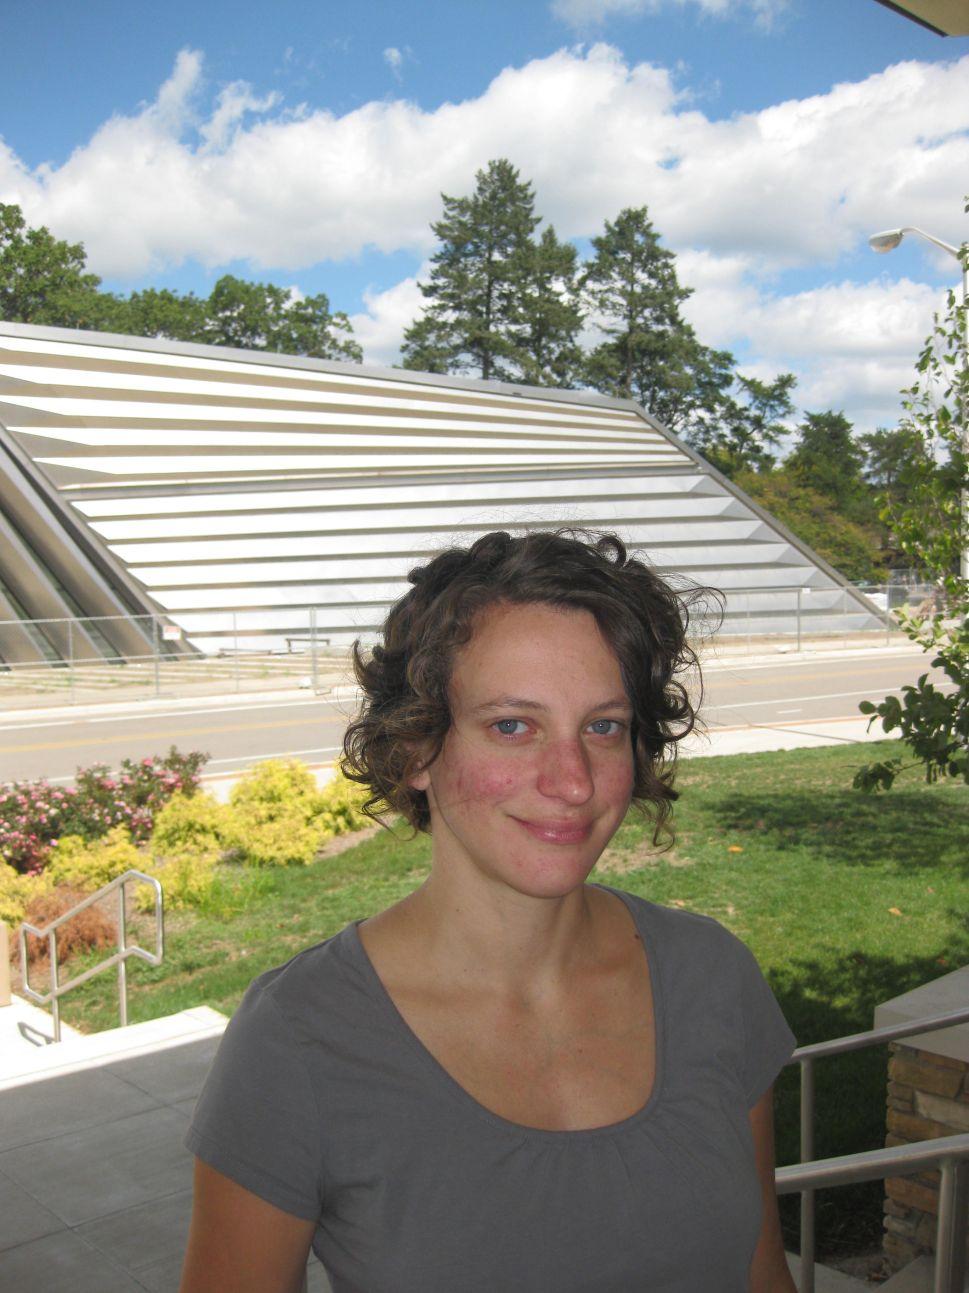 MSU's Broad Art Museum Taps Aimee Shapiro as Director of Education